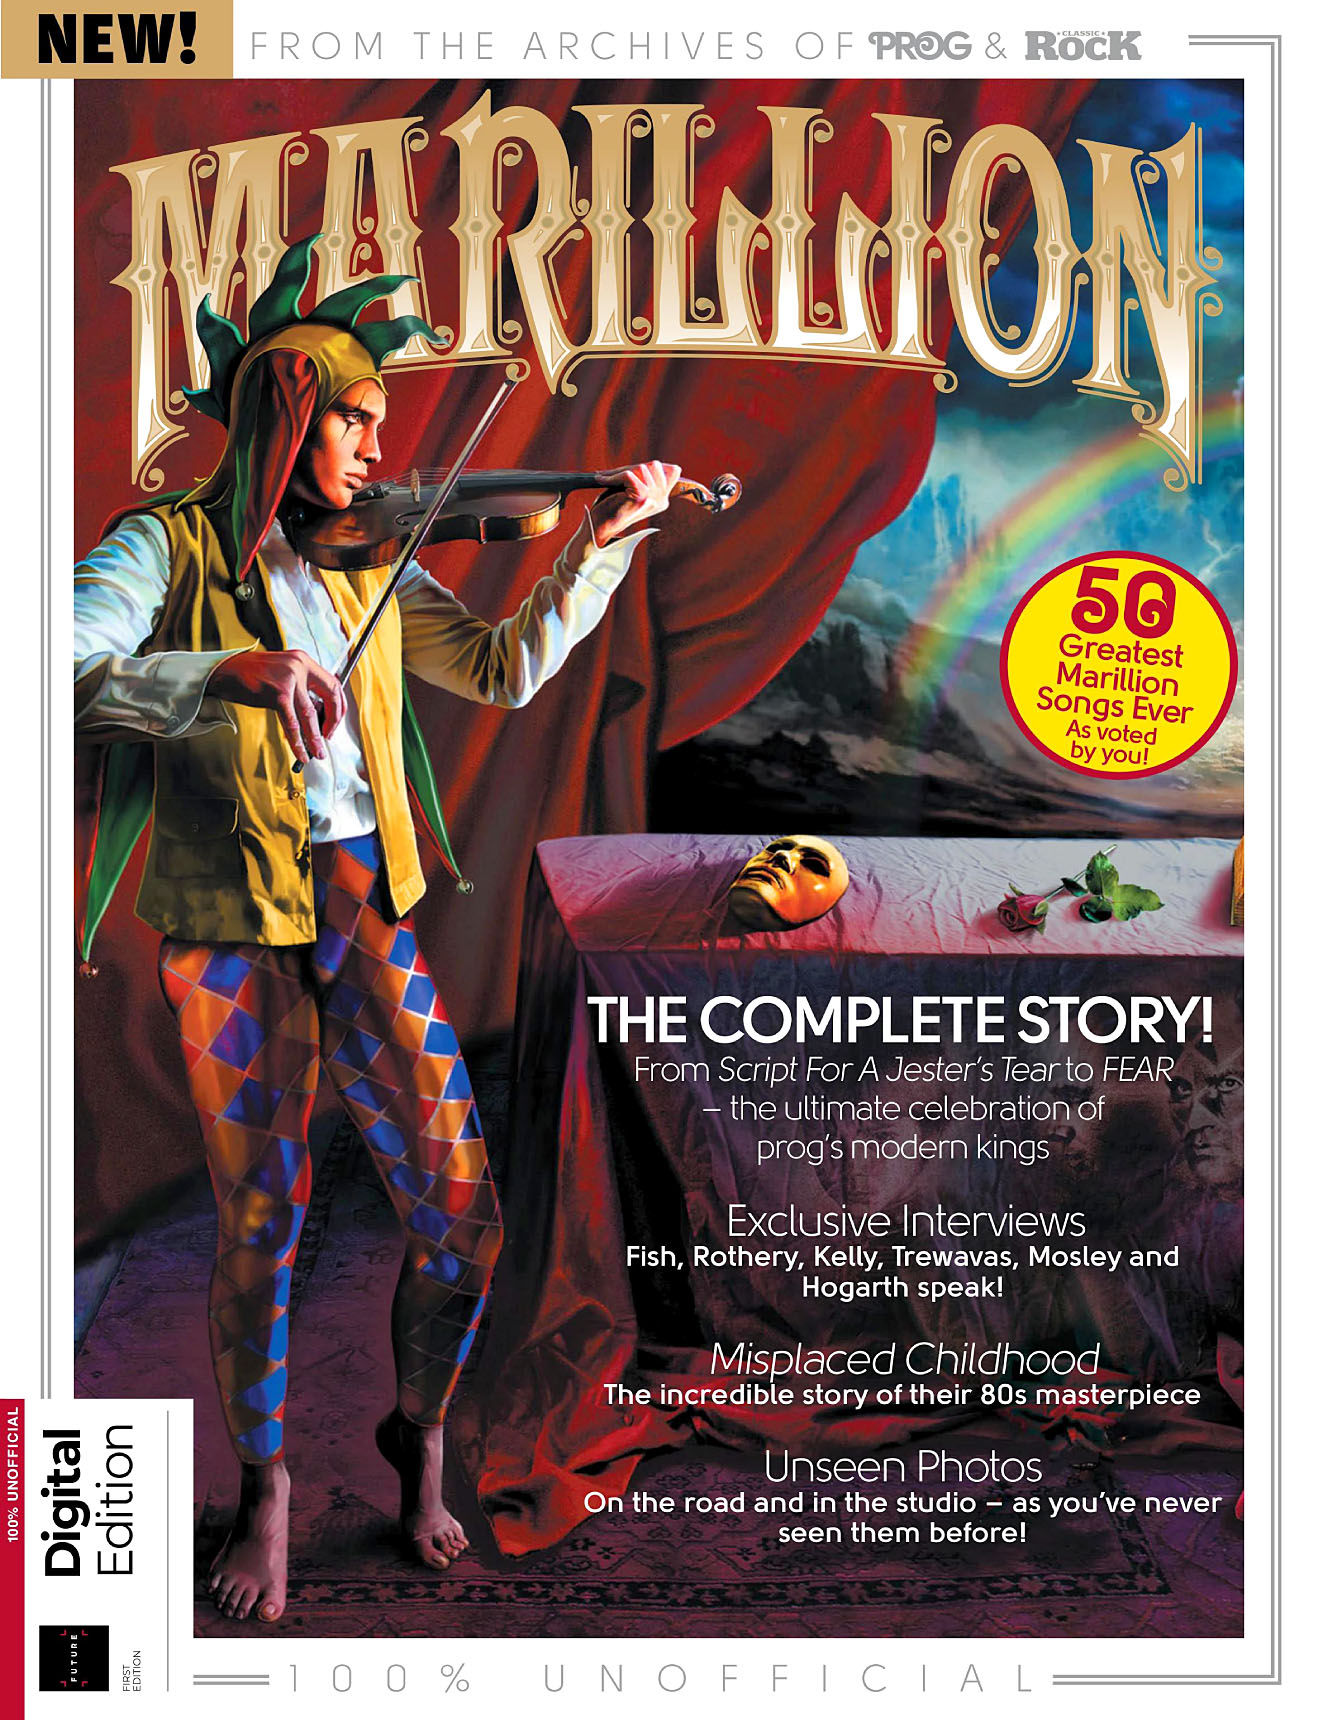 Prog Sp Marillion 1st Ed 2020.jpg